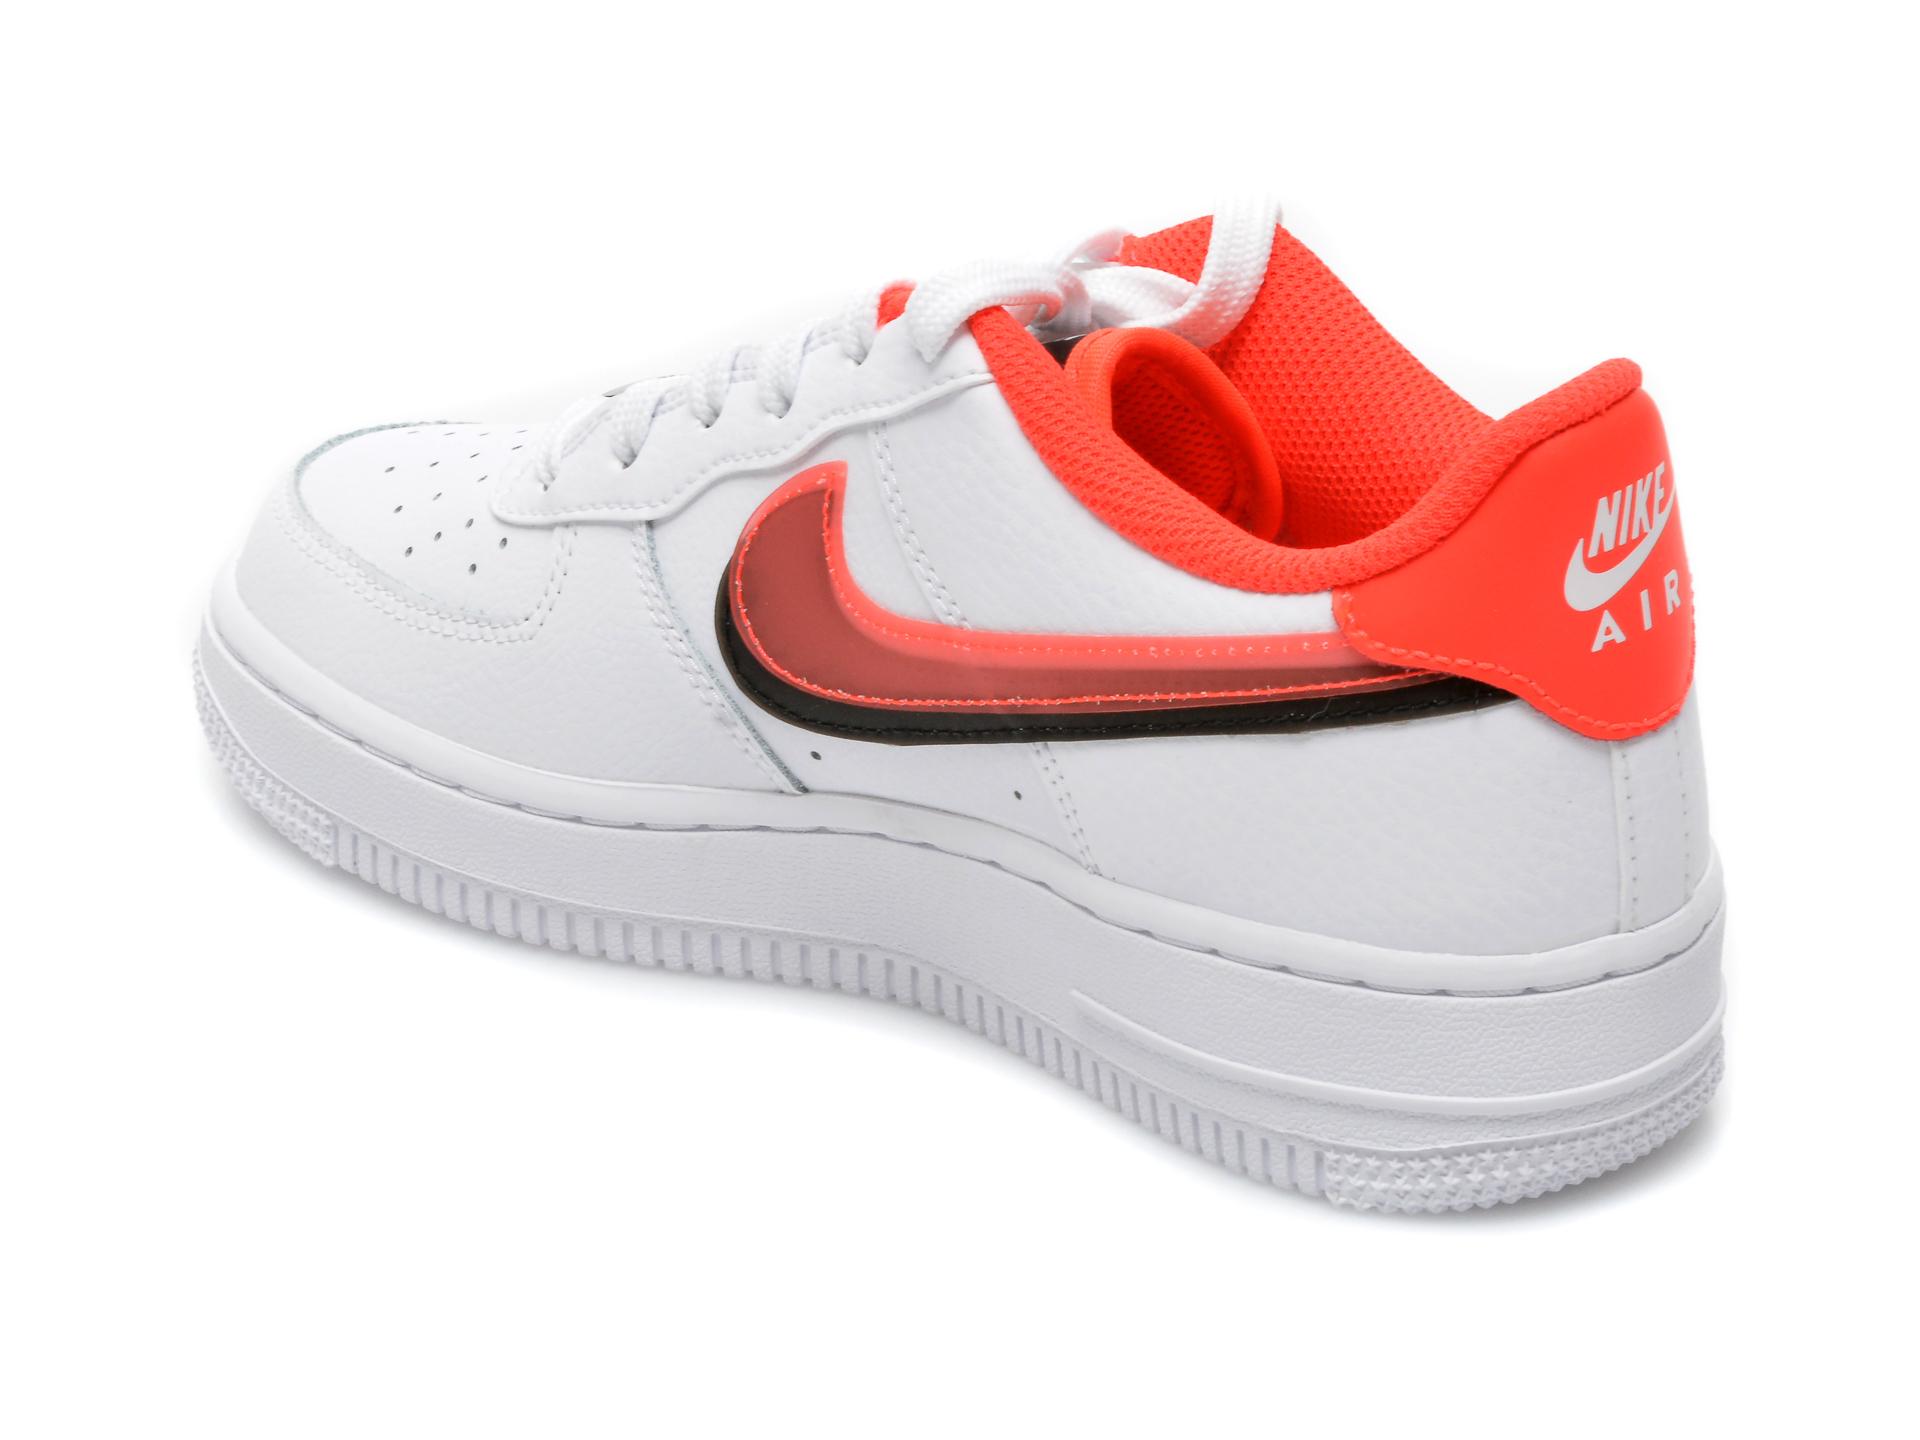 Pantofi sport NIKE albi, AIR FORCE 1 LV8 (GS), din piele naturala - 5